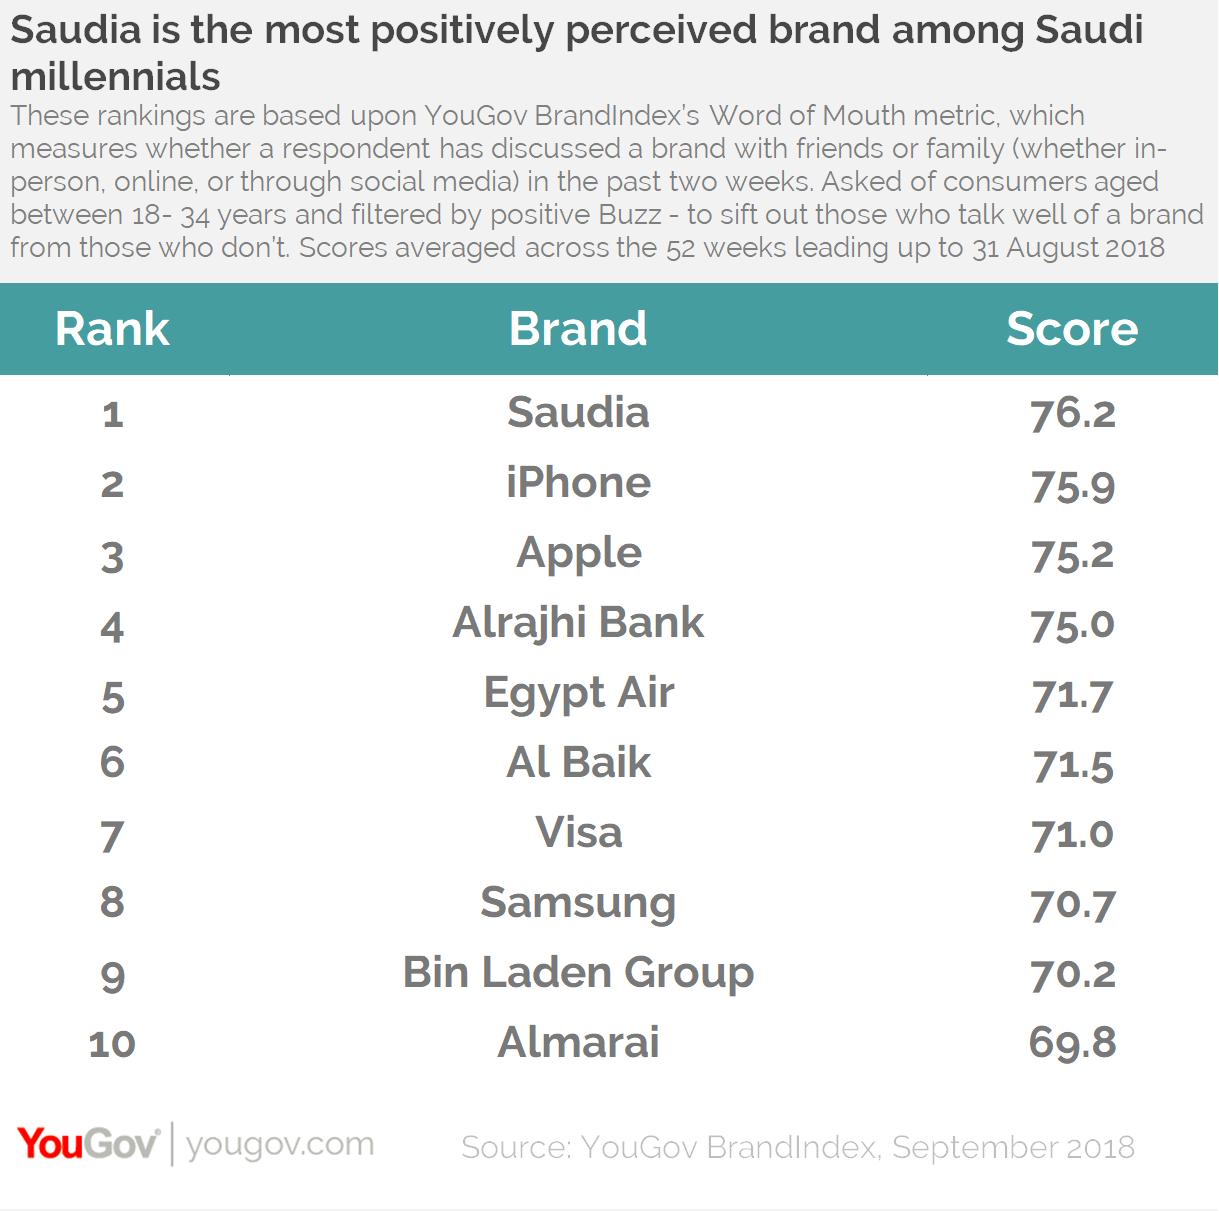 YouGov Millennial Brand Rankings: Top 10 KSA